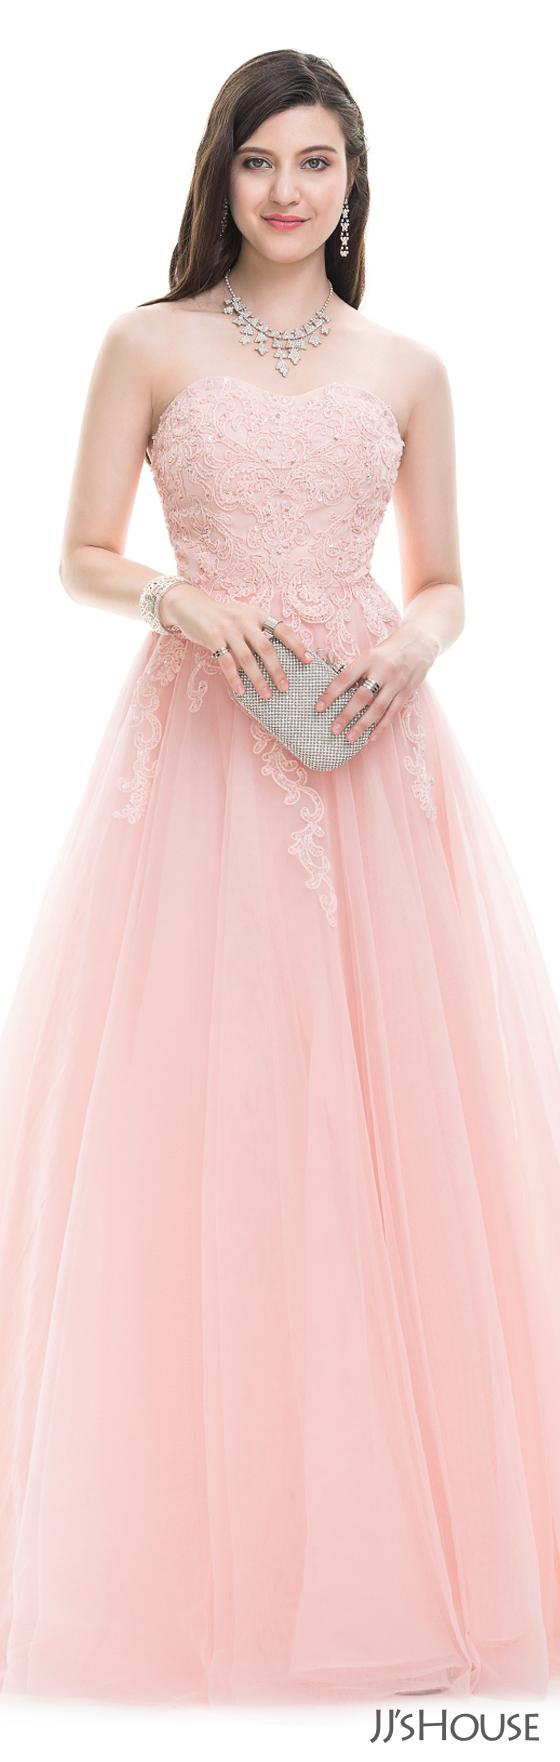 JJsHouse #Prom   Vestidos   Pinterest   Vestiditos, Vestido largo y ...